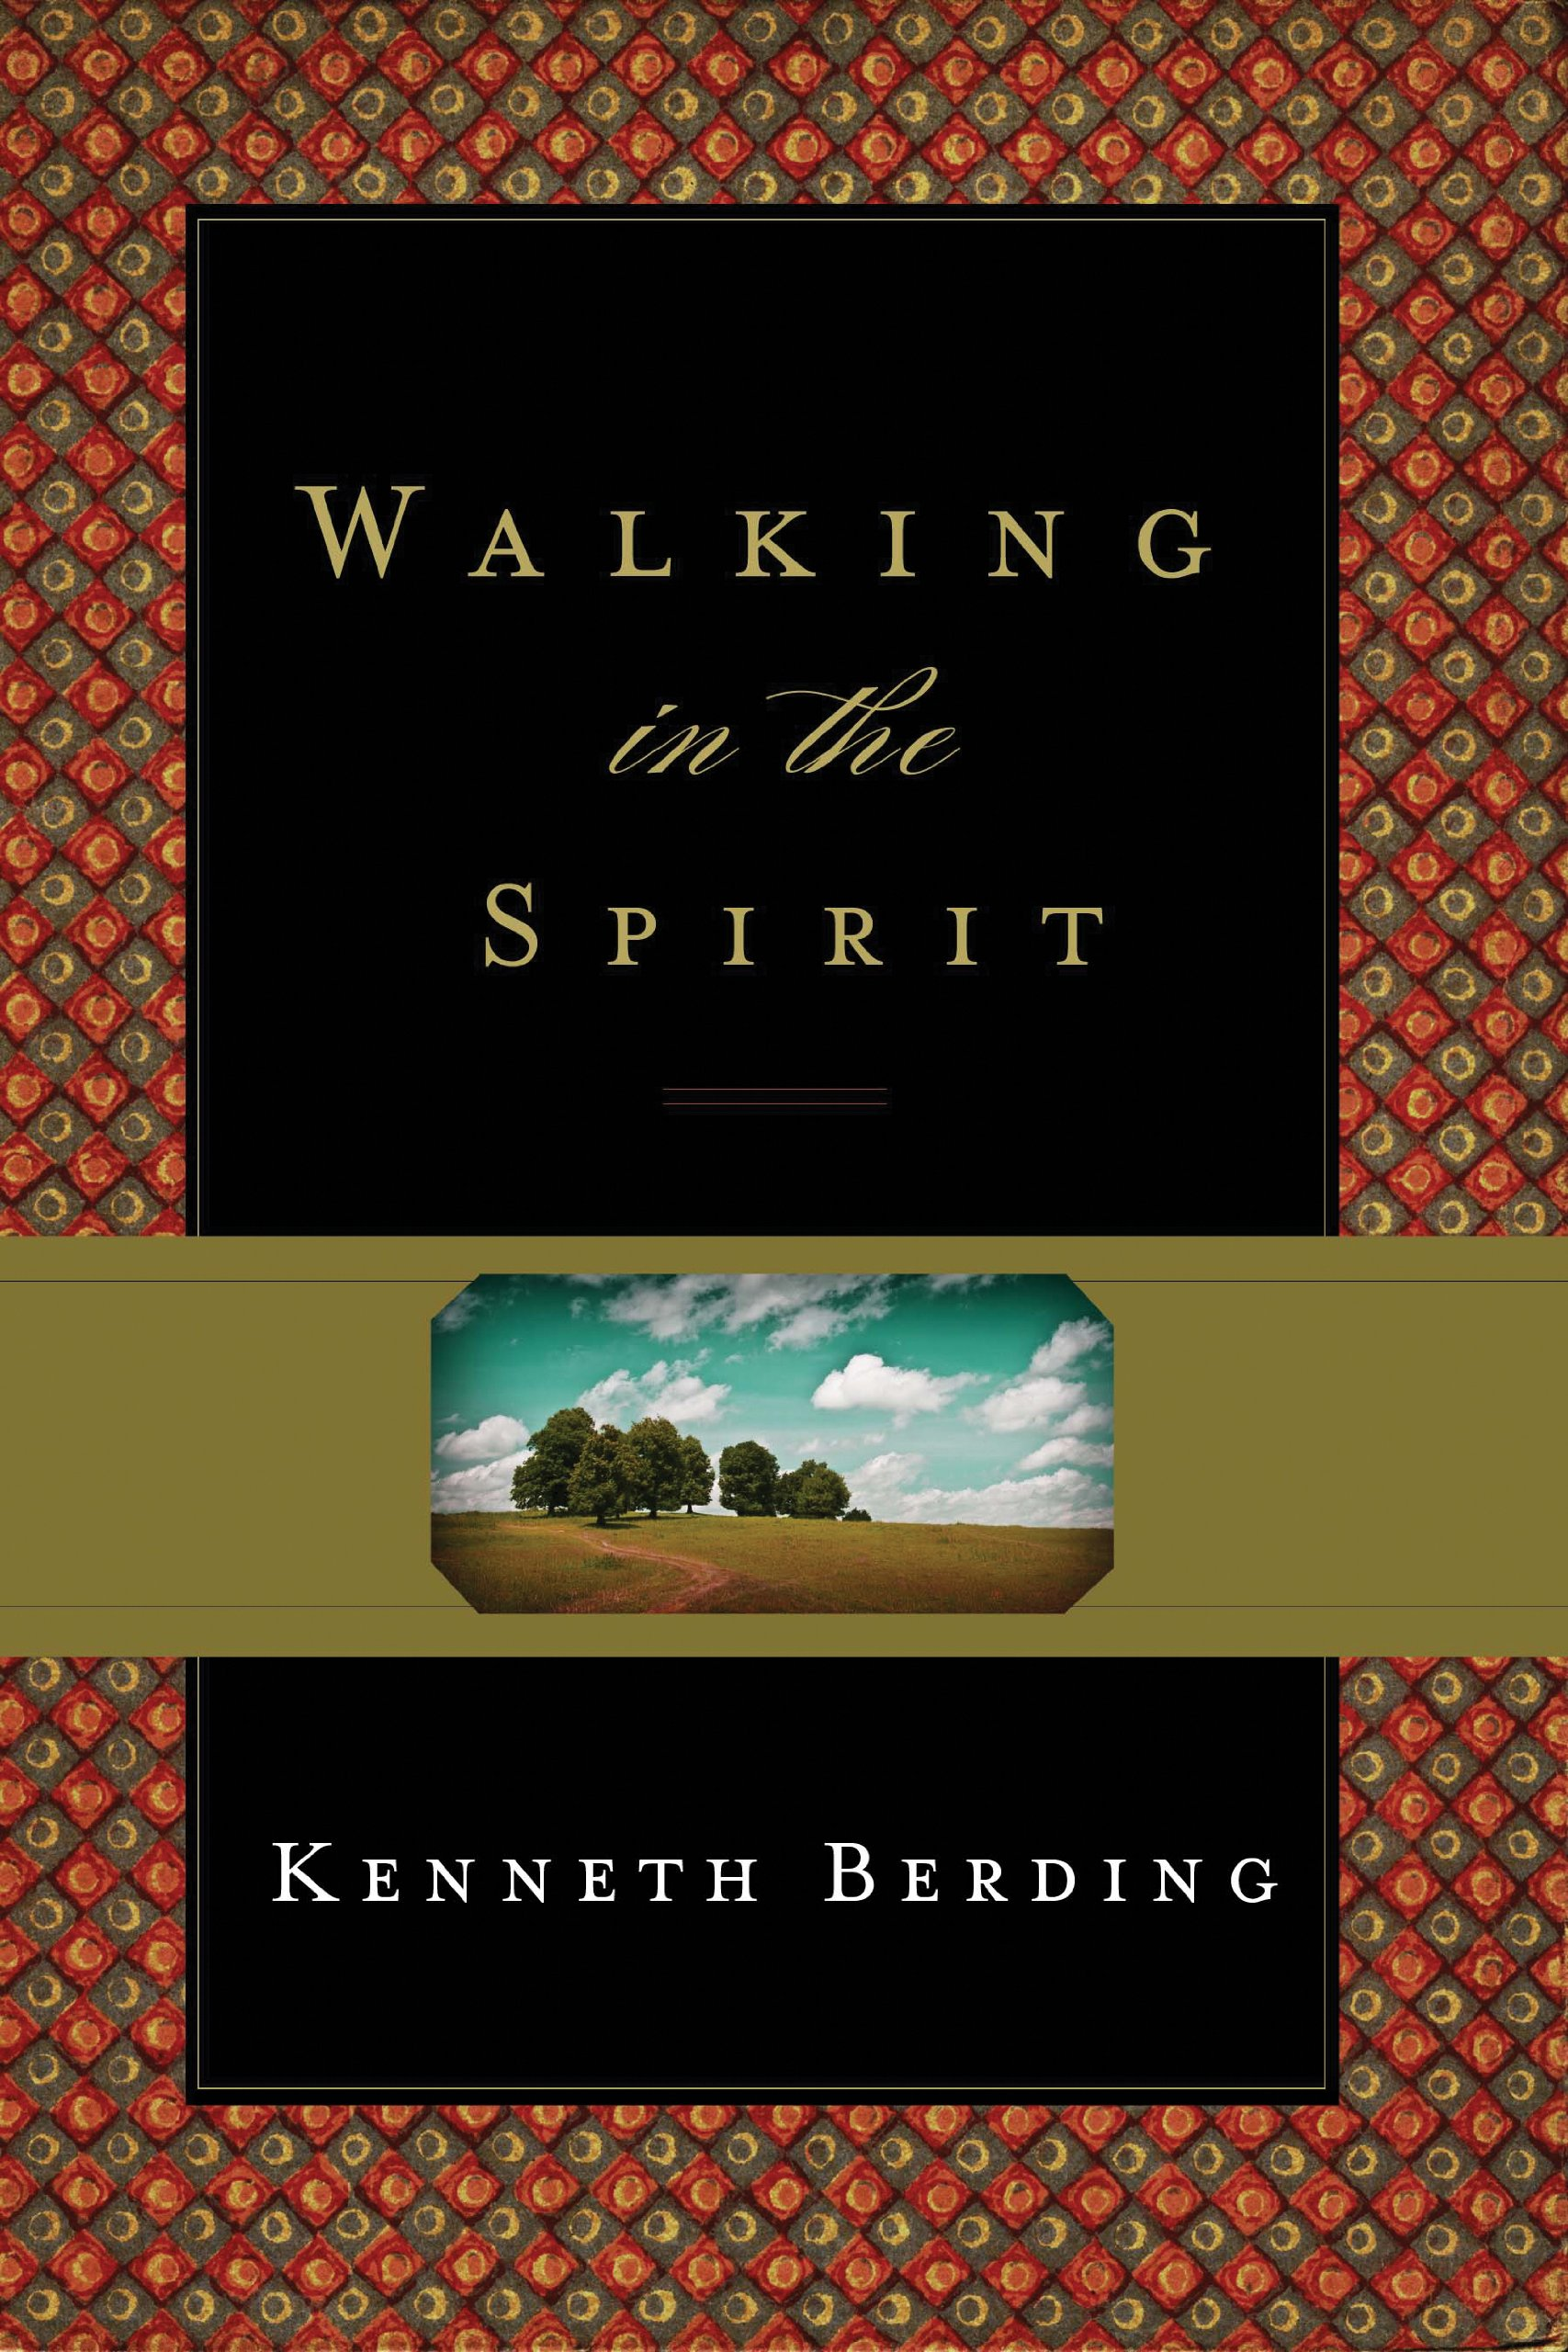 Walking in the Spirit: Kenneth Berding: 9781433524103: Amazon.com: Books